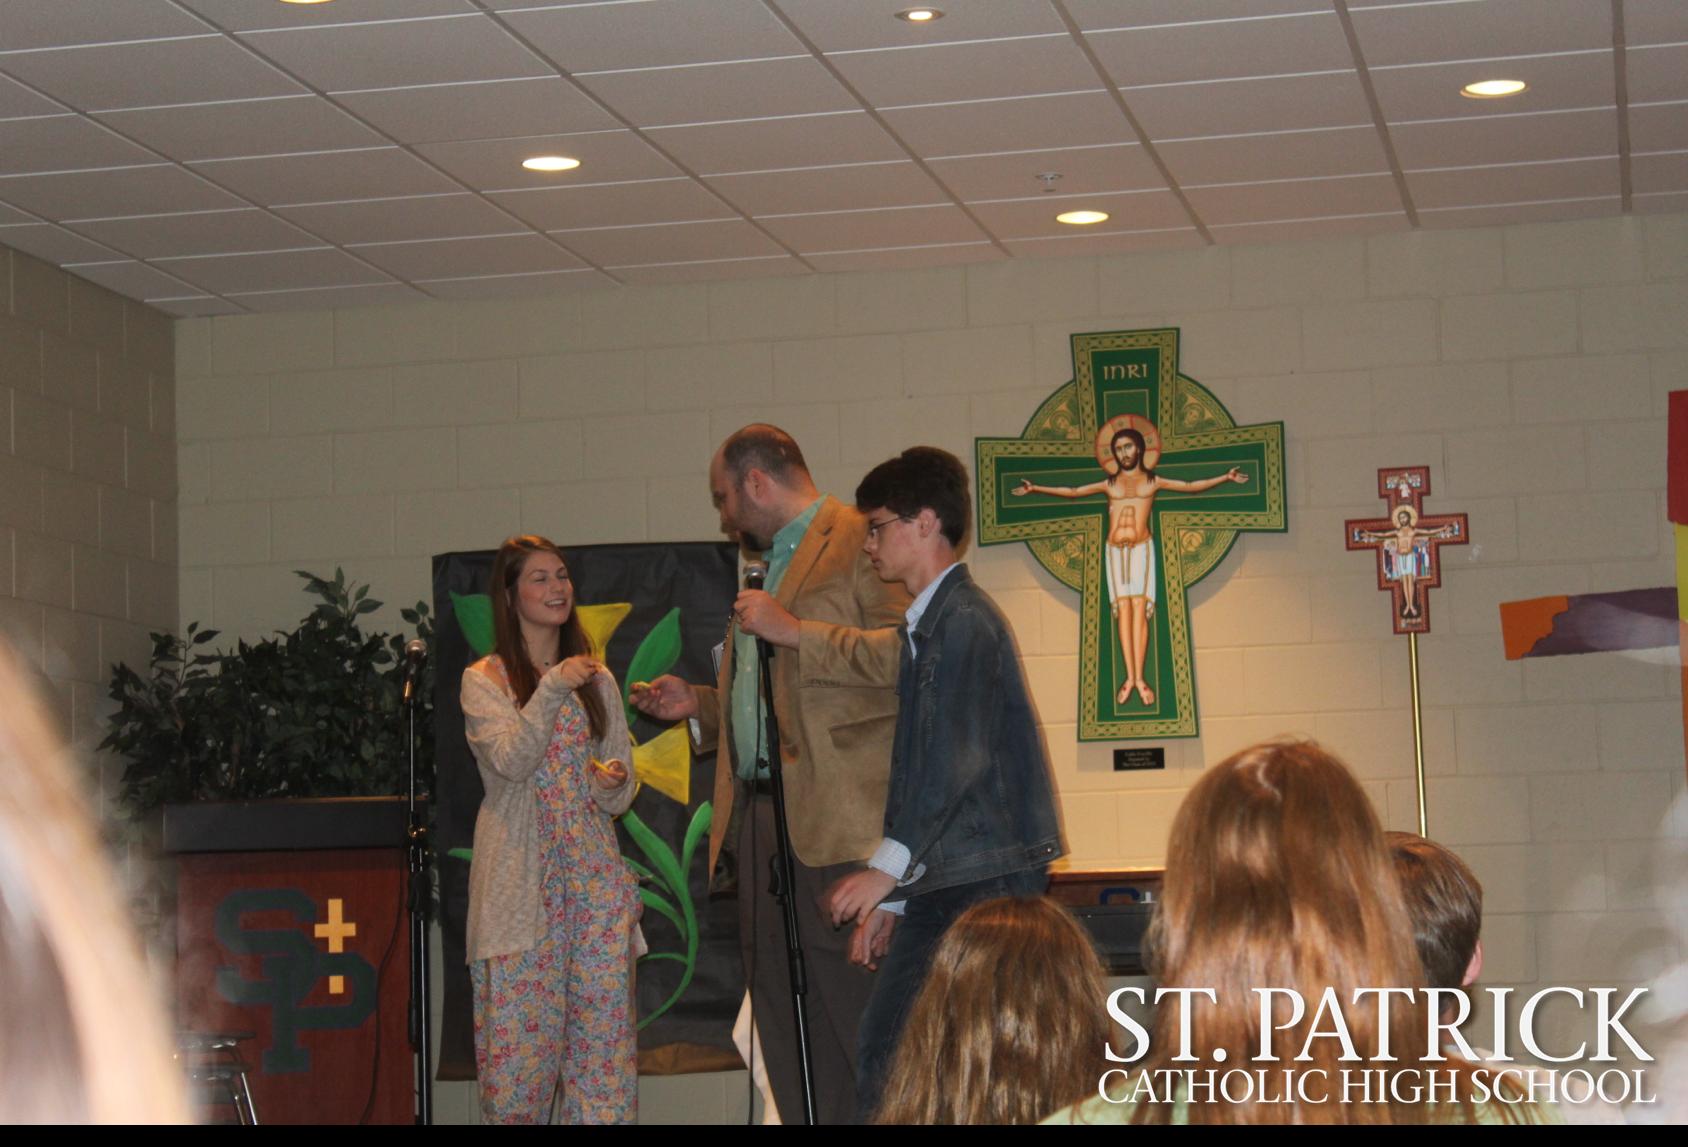 2017 St Patrick Catholic High School